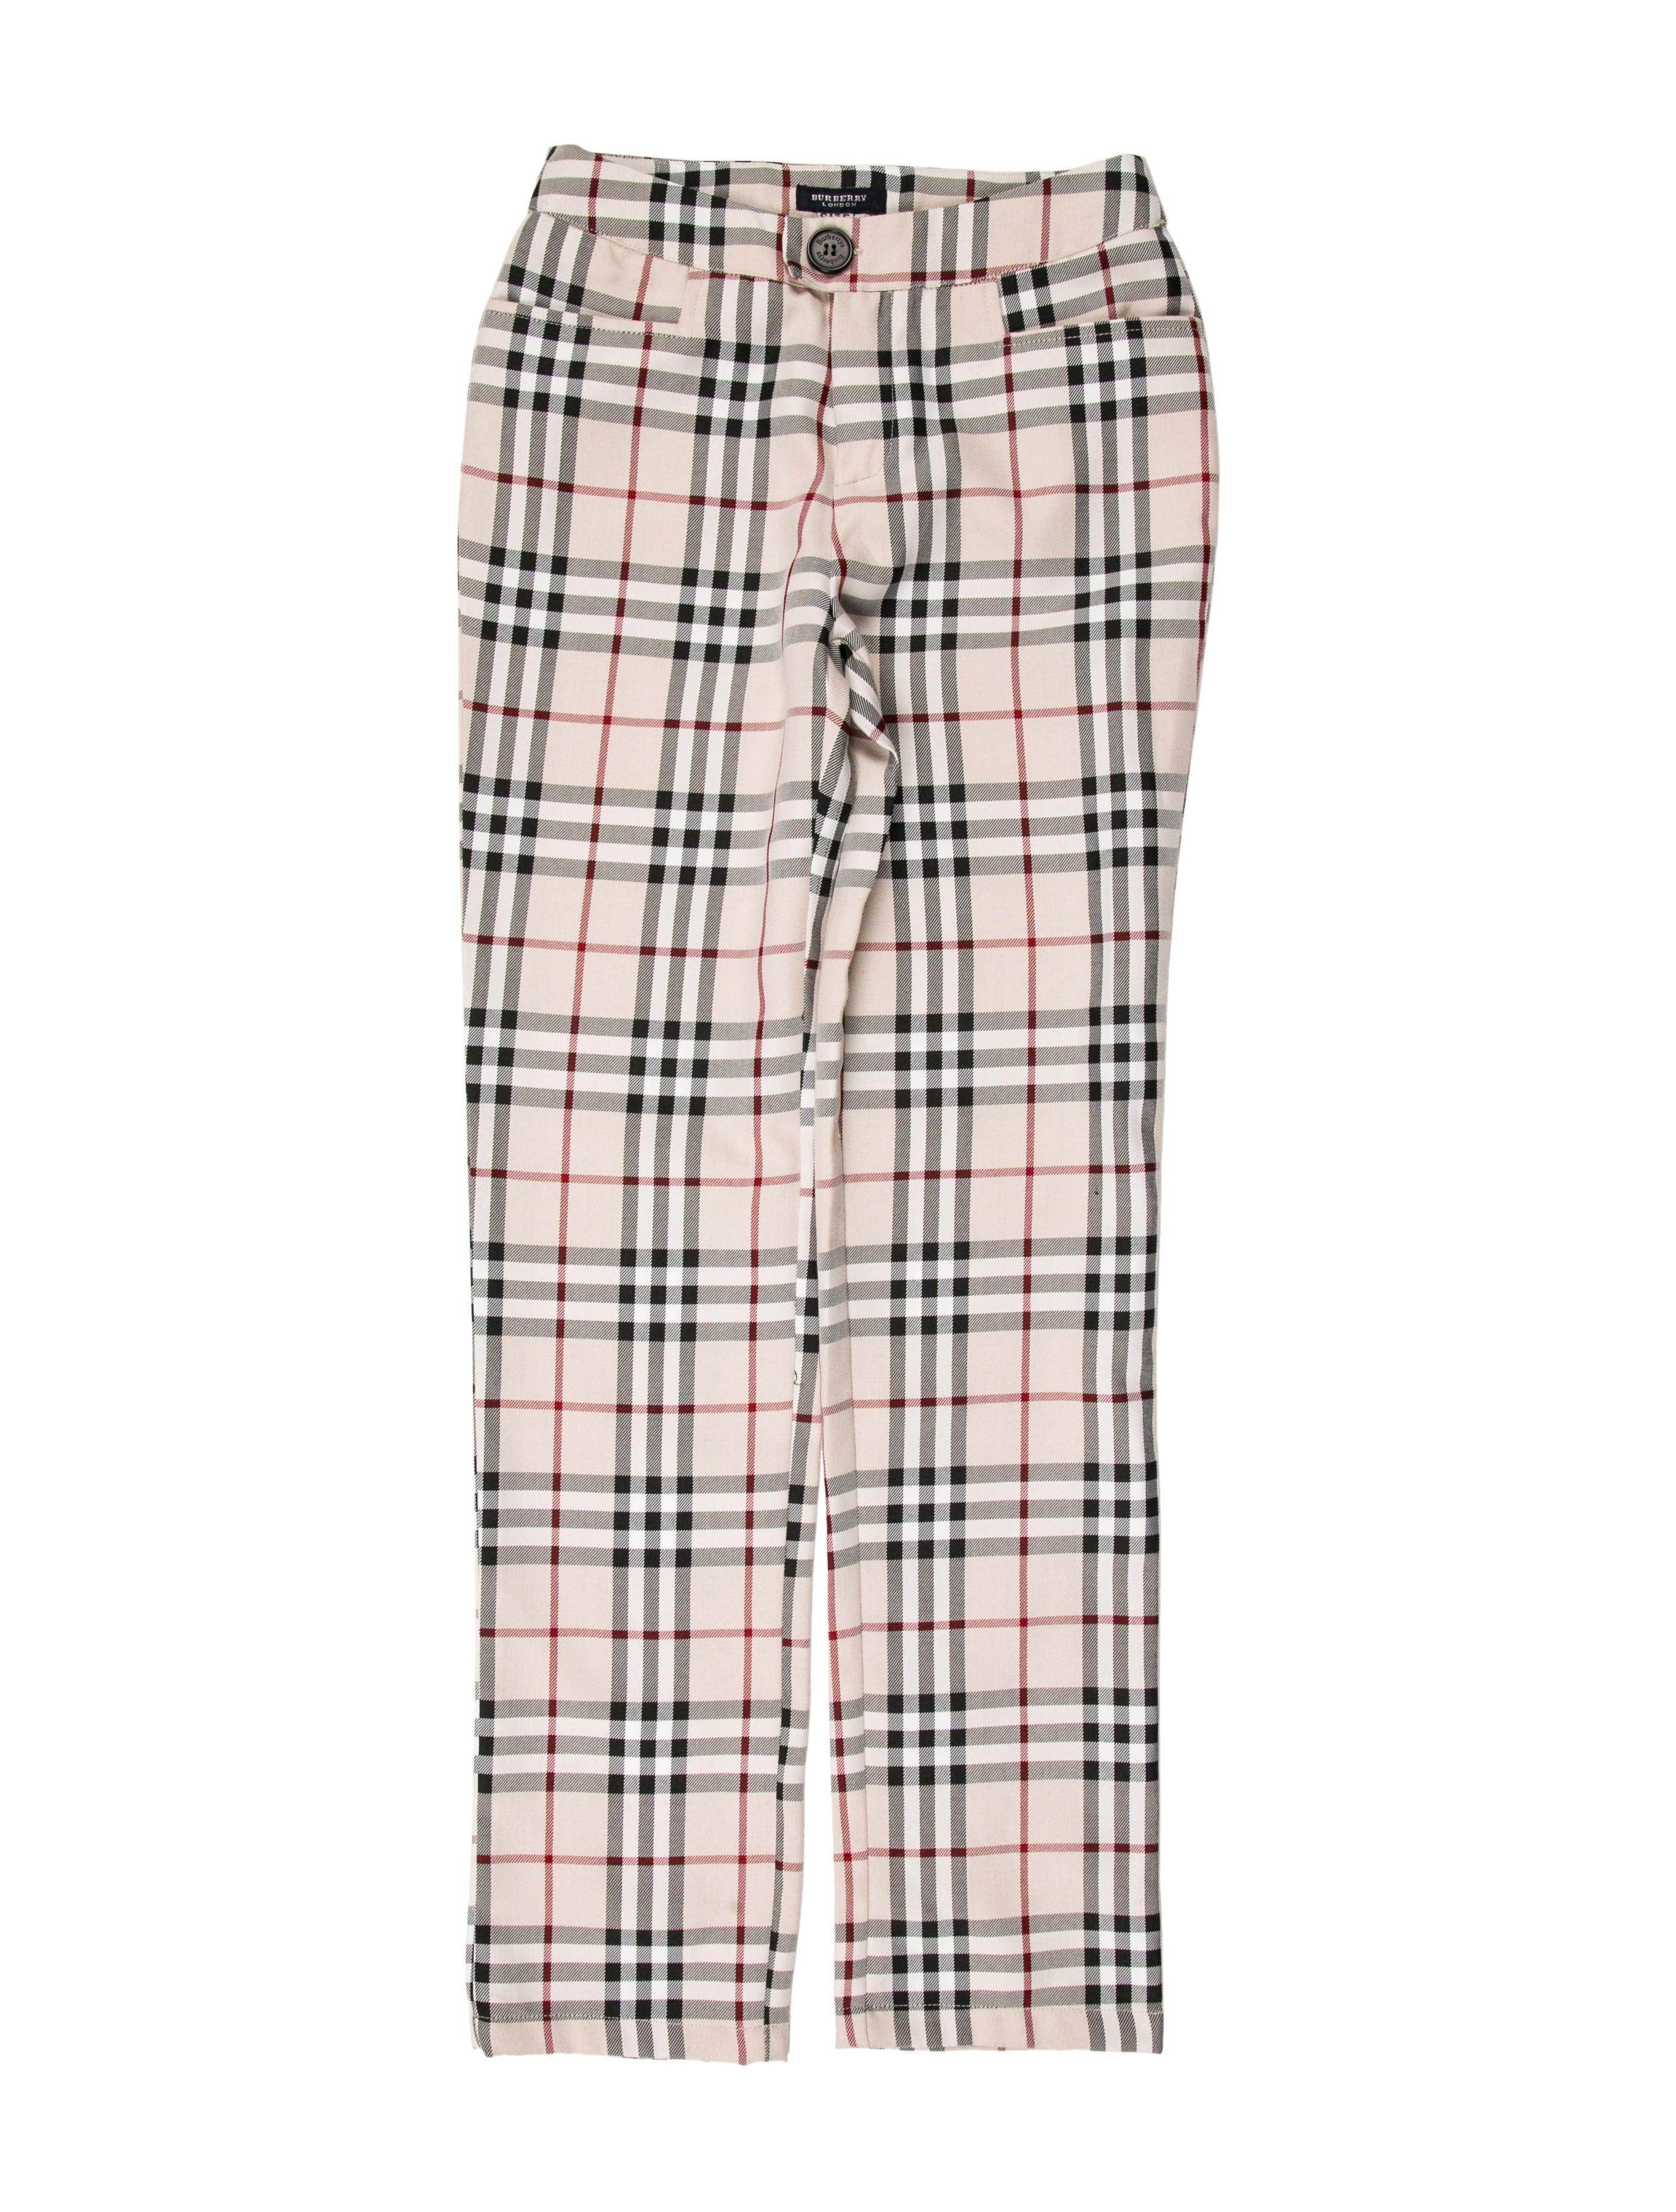 b90f7f72b611 Burberry Vintage Mid-Rise Pants - Clothing - BUR92785